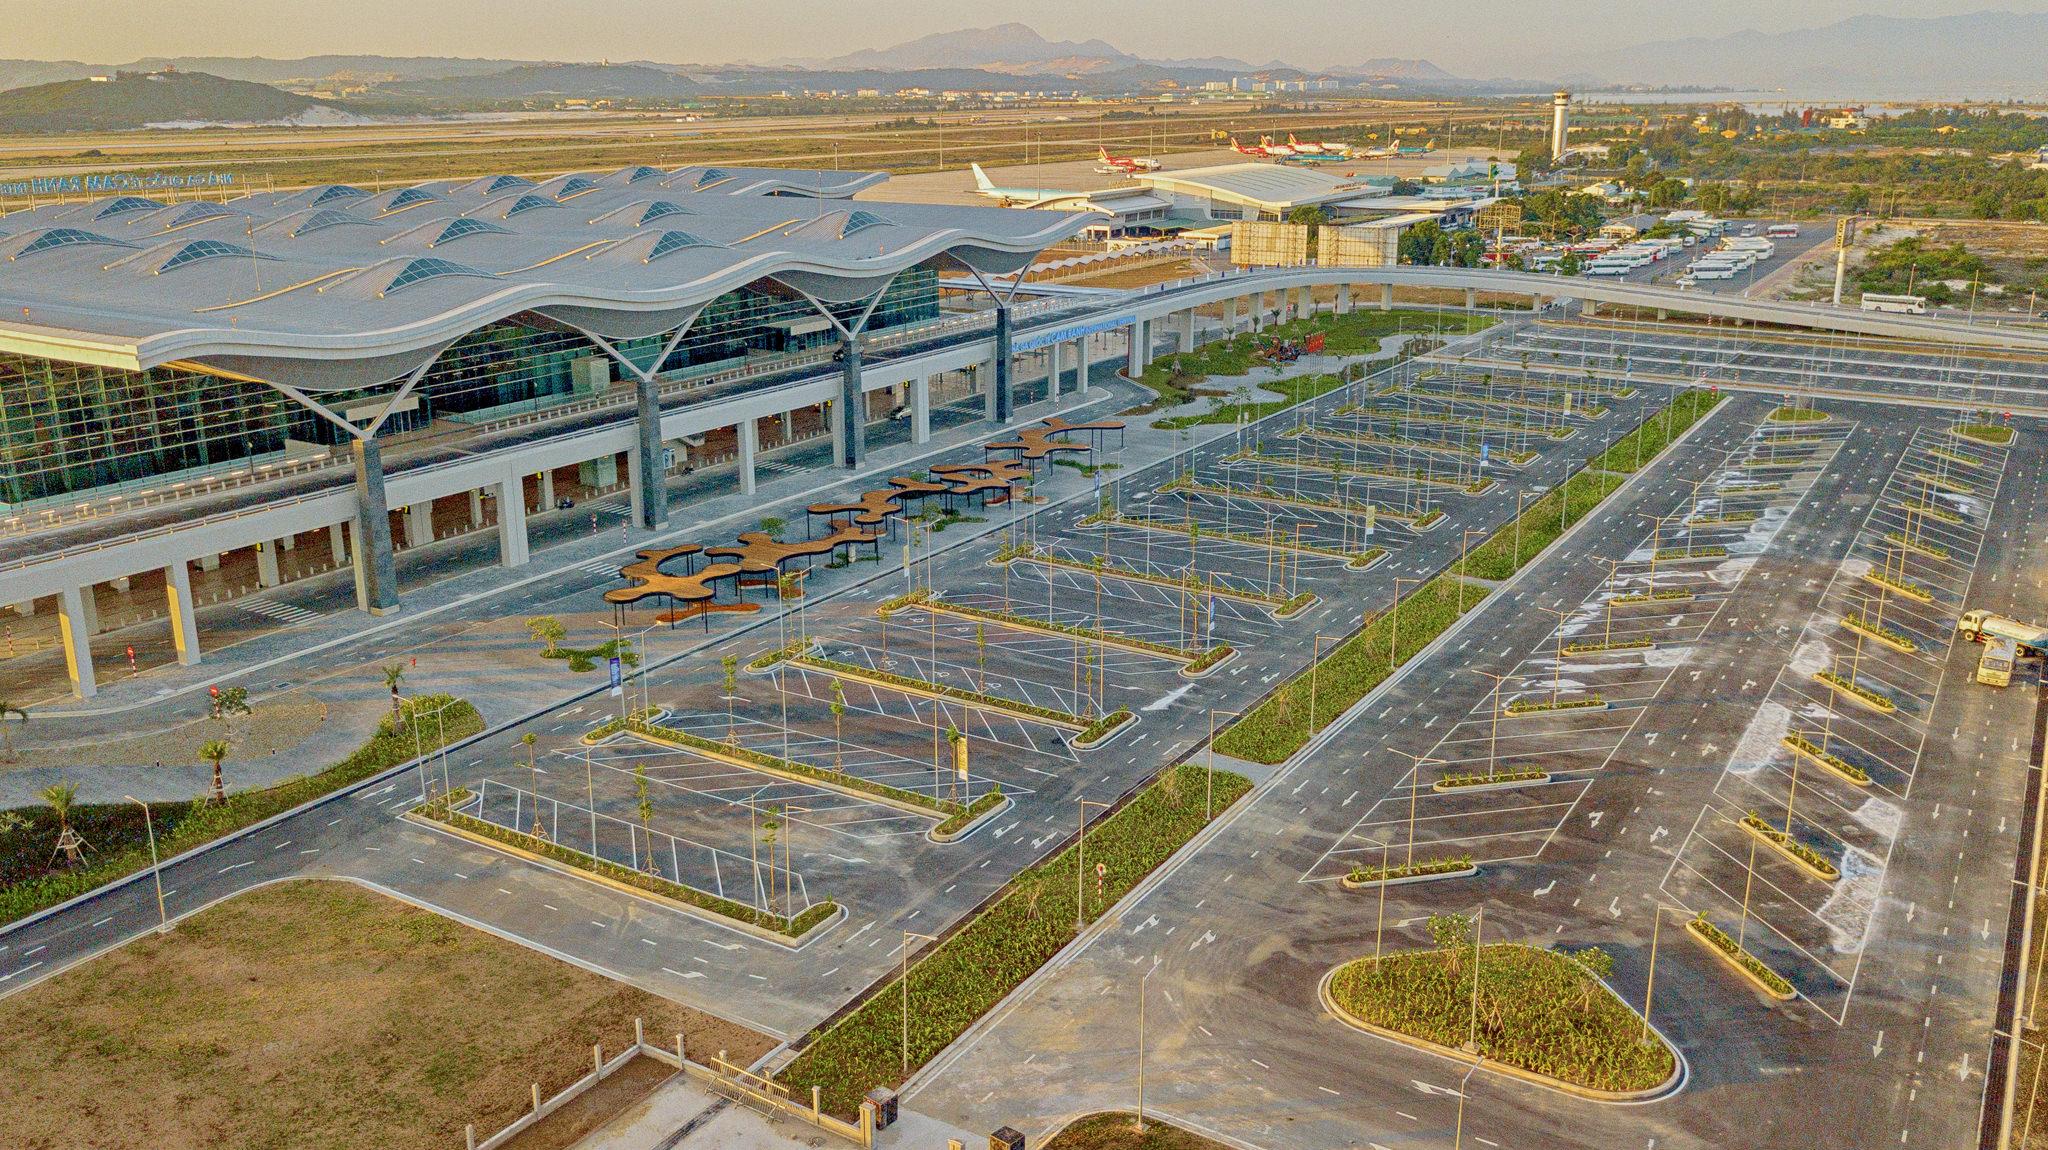 20180626 - Cam Ranh Airport - Architecture - Flycam - 0013.jpg